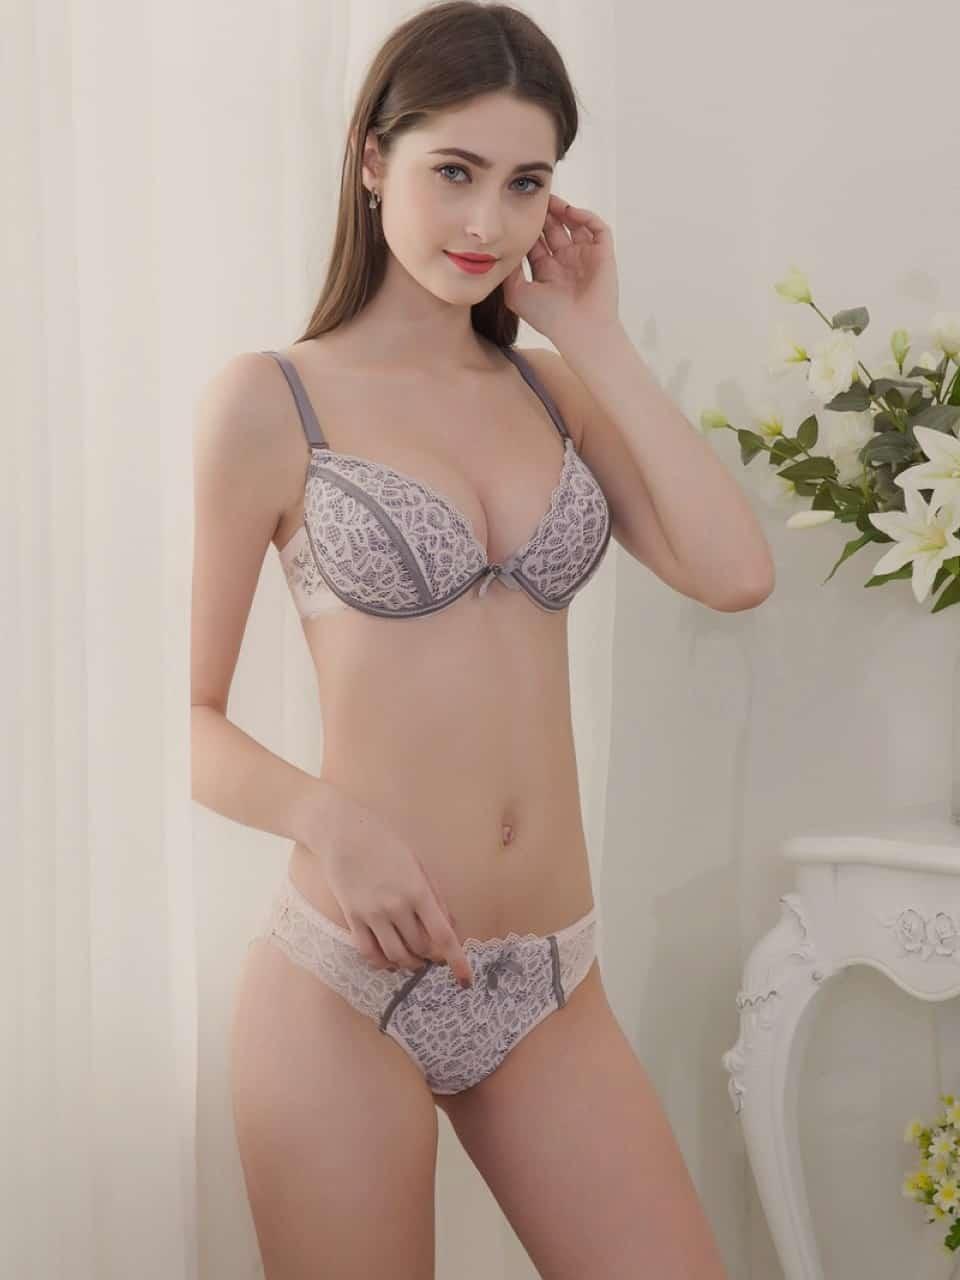 Paris escort girl - Rosamonde